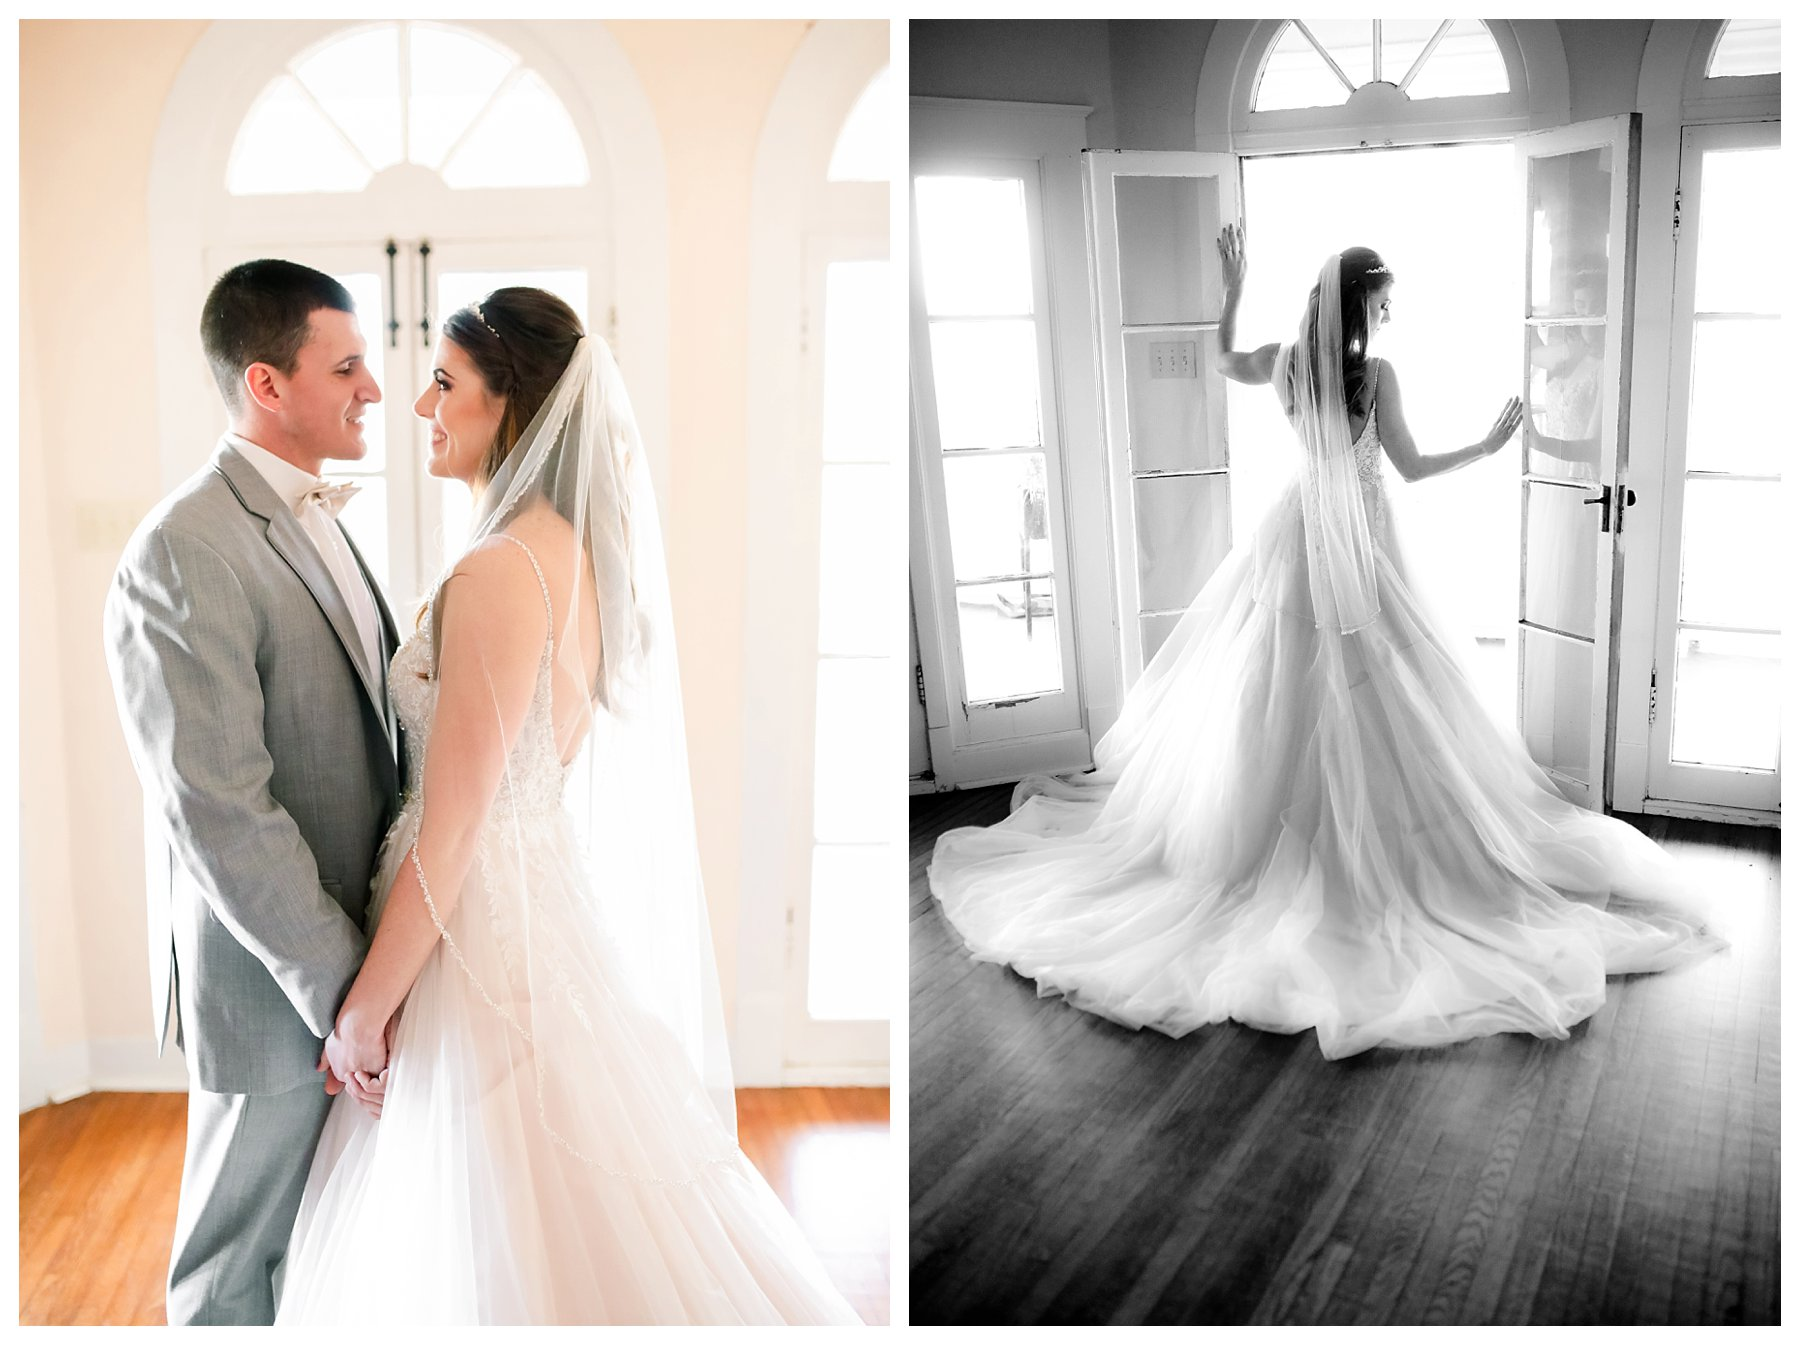 photographer_wedding_saint_louis_Kansas_City_Photography_Videography_workshop_training_styled_engagement_Lake_Ozark_KC_MO_STL_Rolla_Hermann_Saint_James_0354.jpg